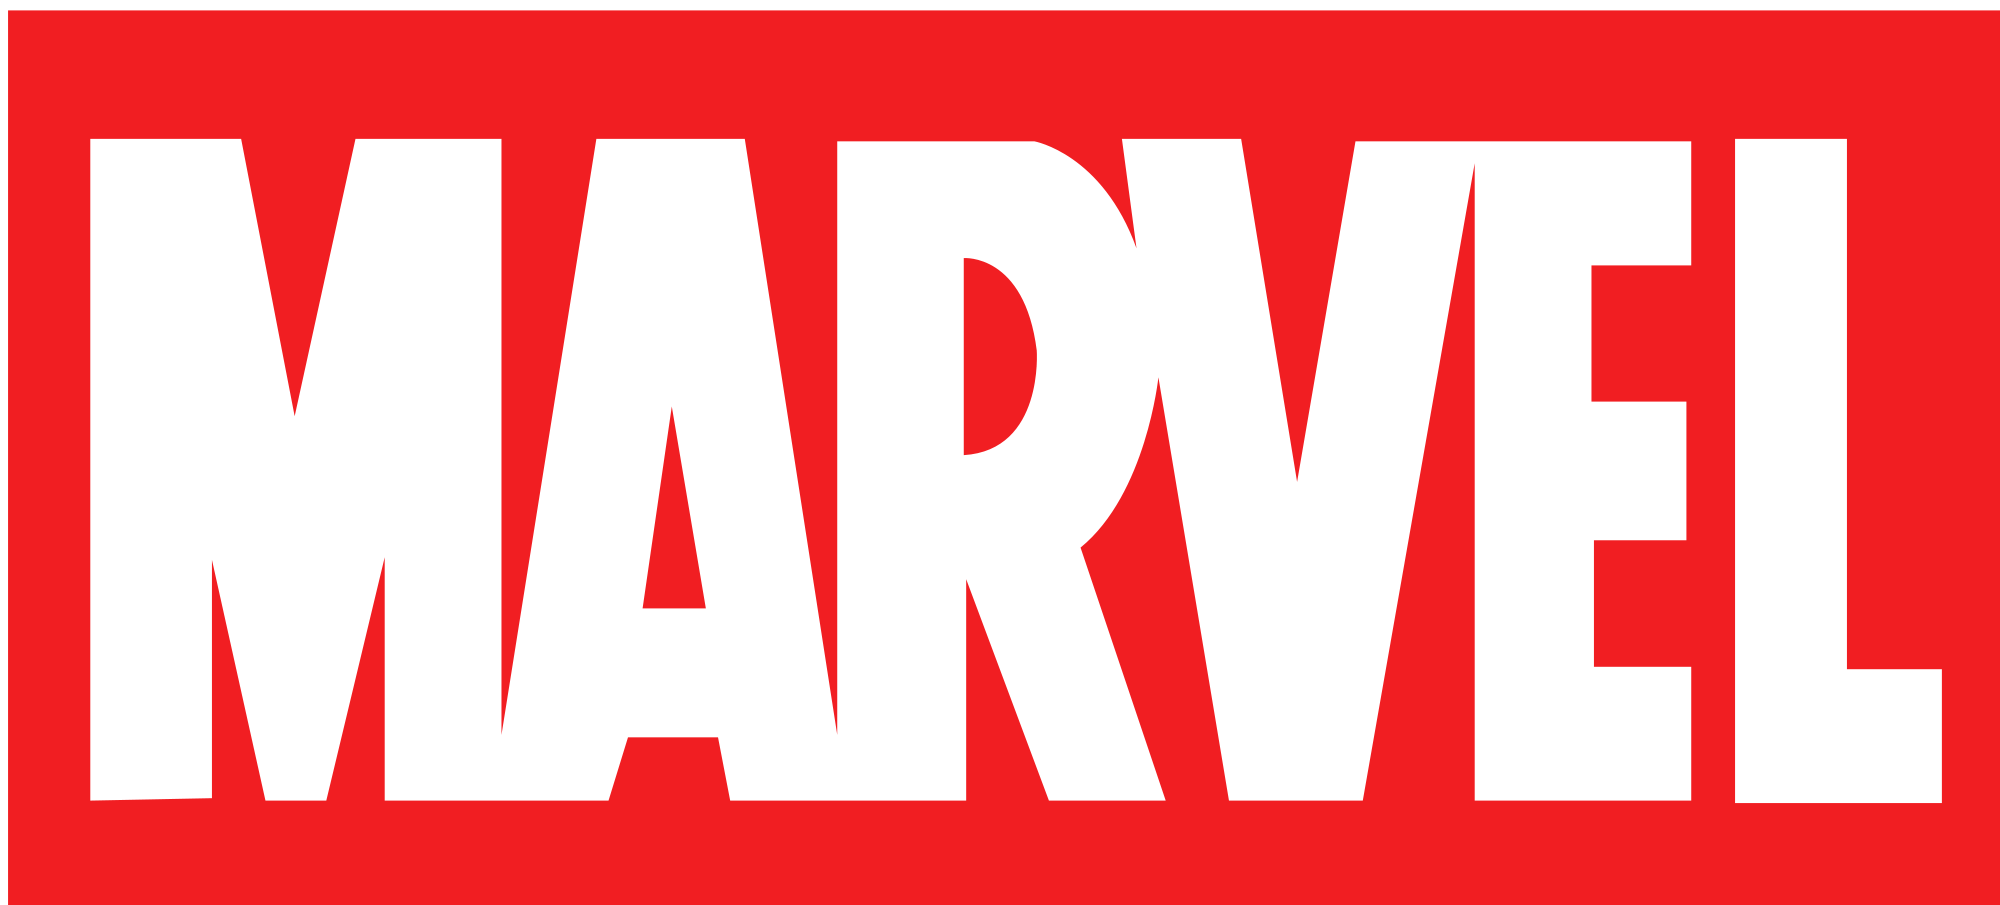 Marvel logo clipart clip art free library Marvel Logo Clipart - Clipart Kid clip art free library